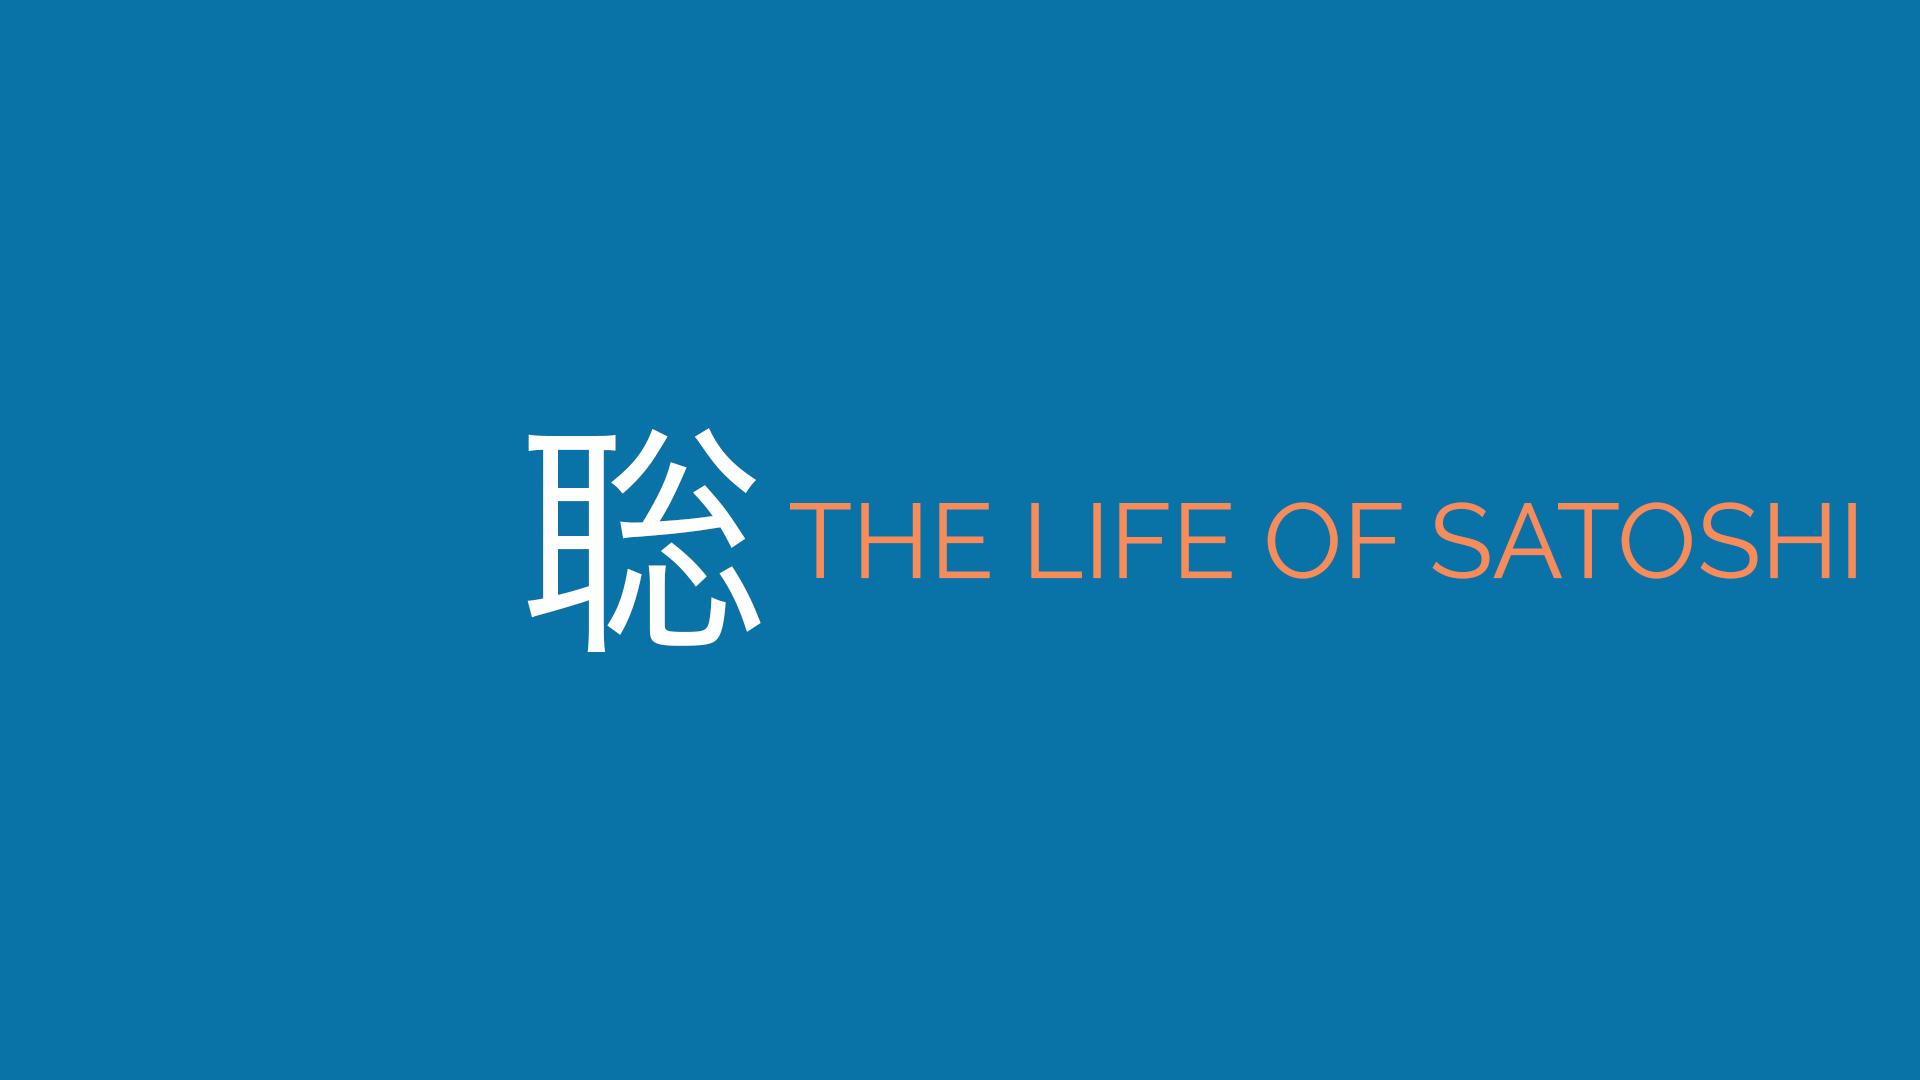 The Life of SATOSHI